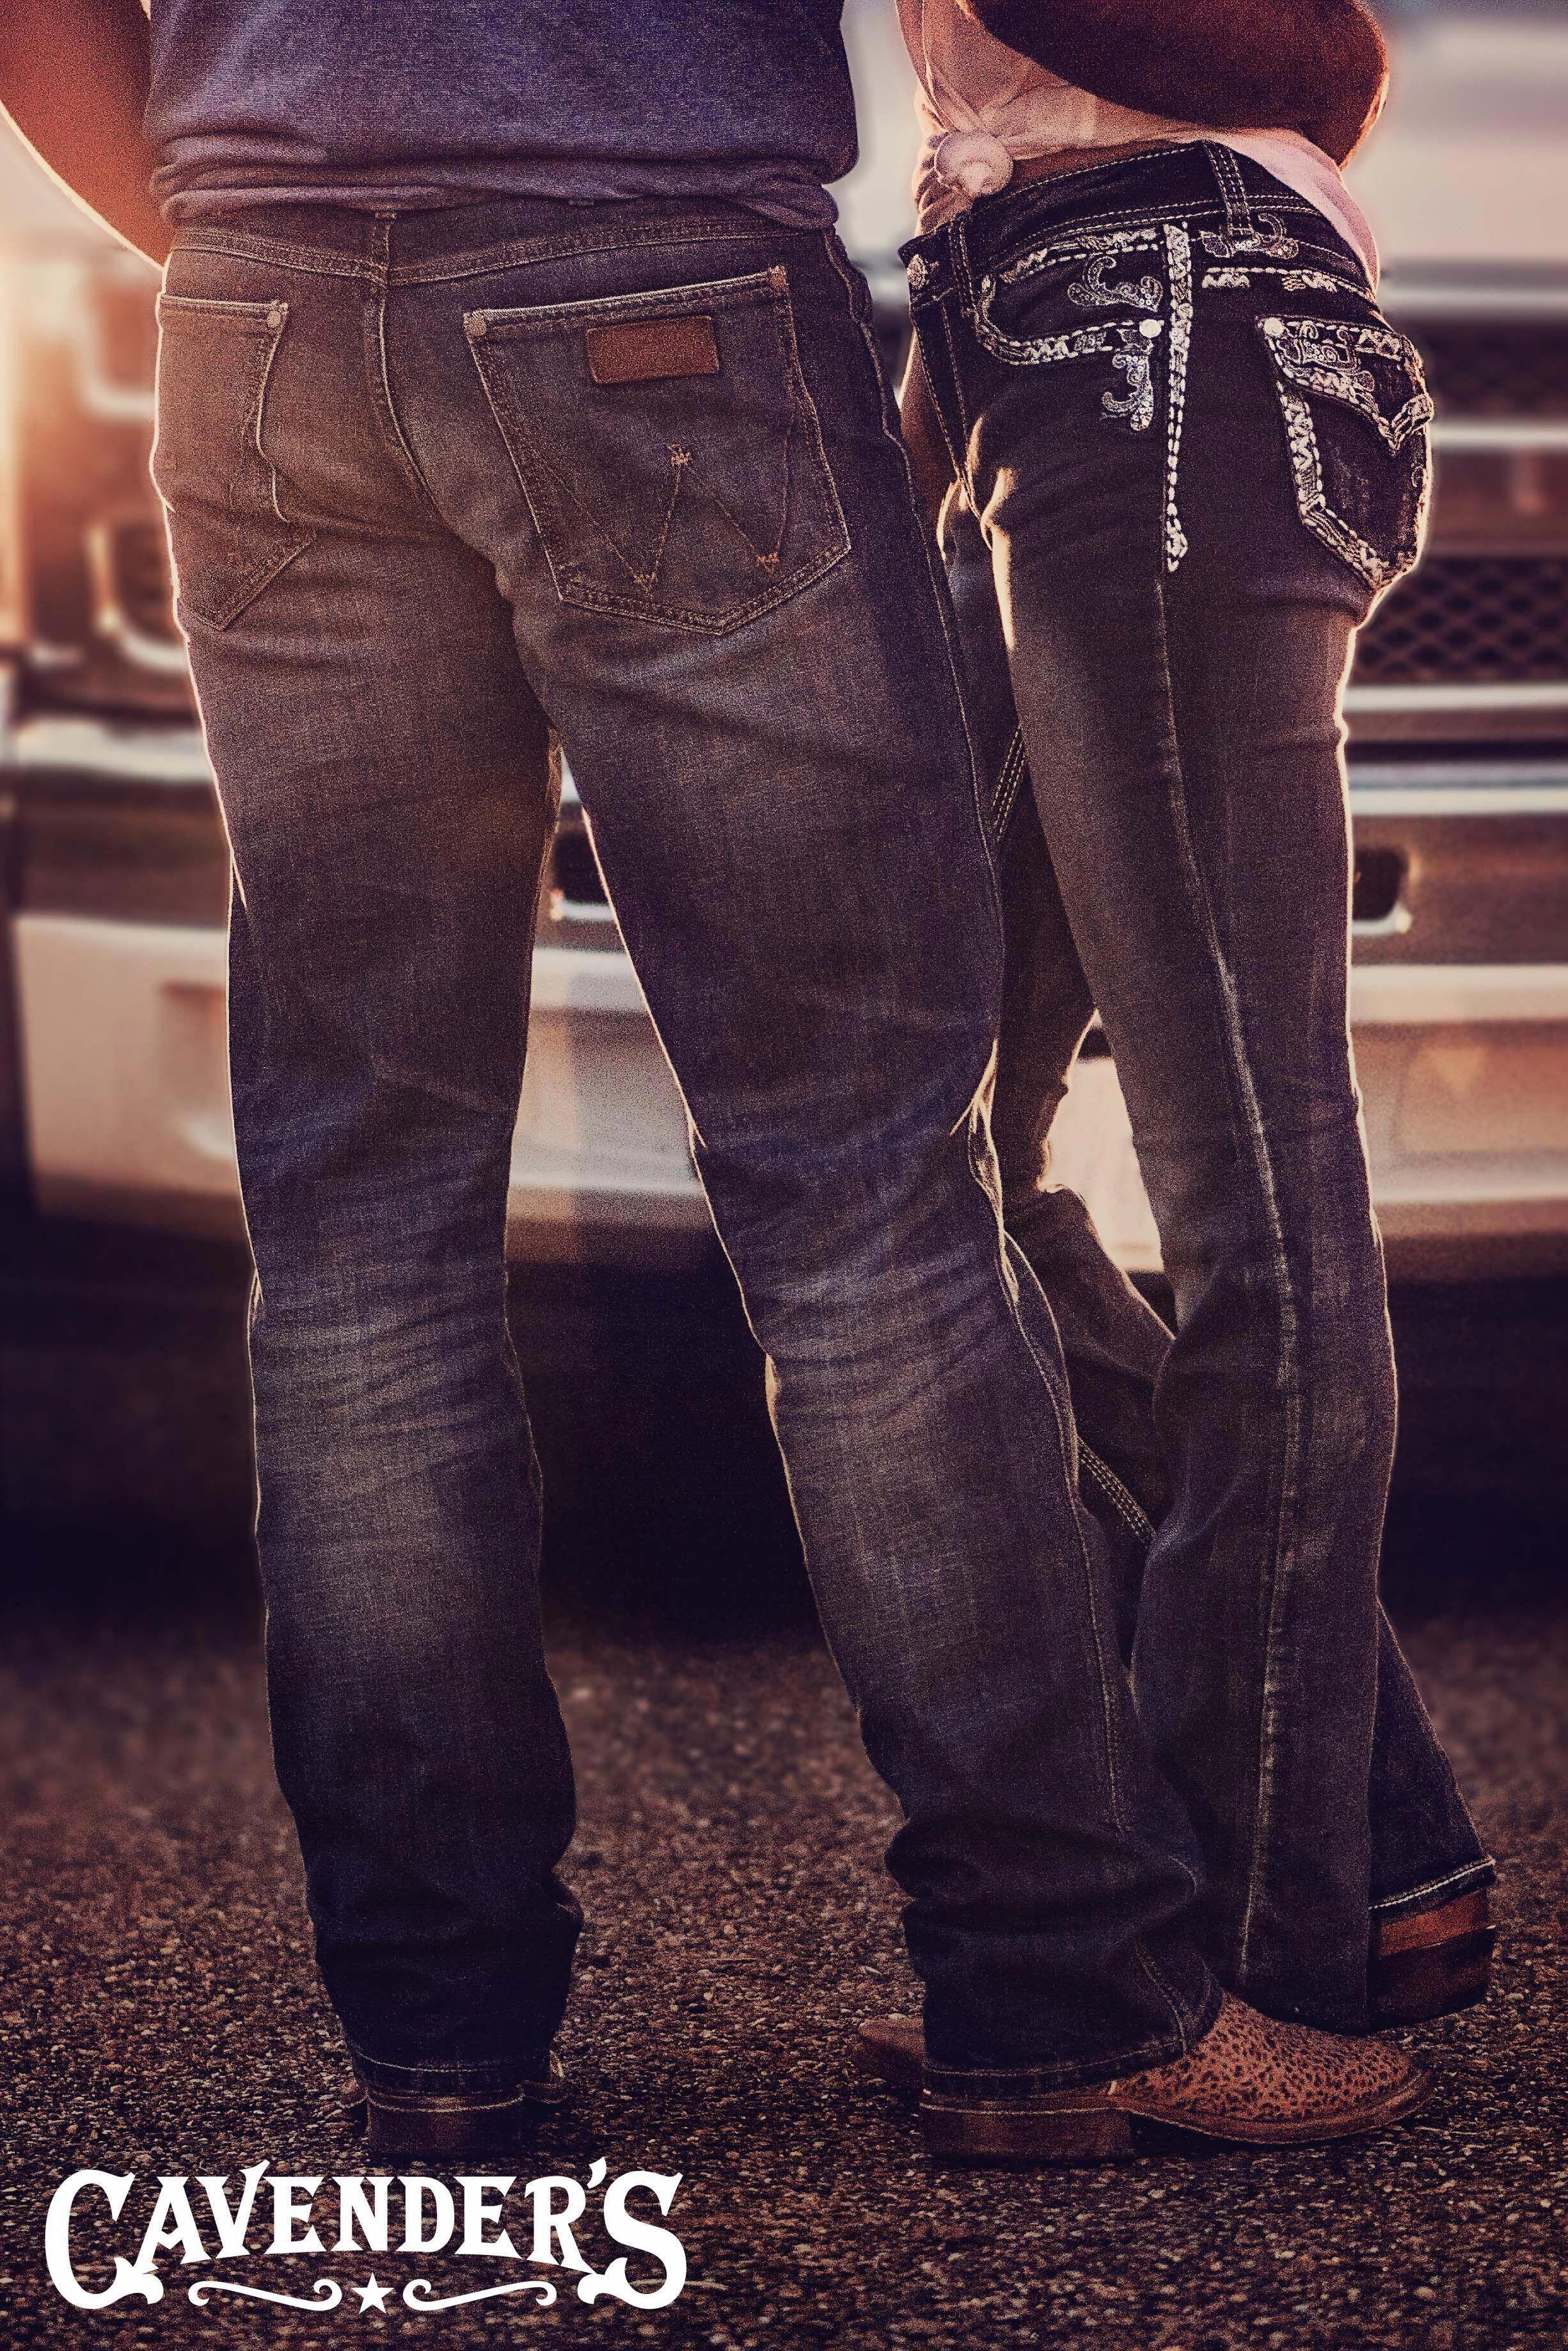 79acb044 Wrangler Retro Men's Medium Dark Wash Slim Fit Boot Cut Jeans #jeans  #MensJeans